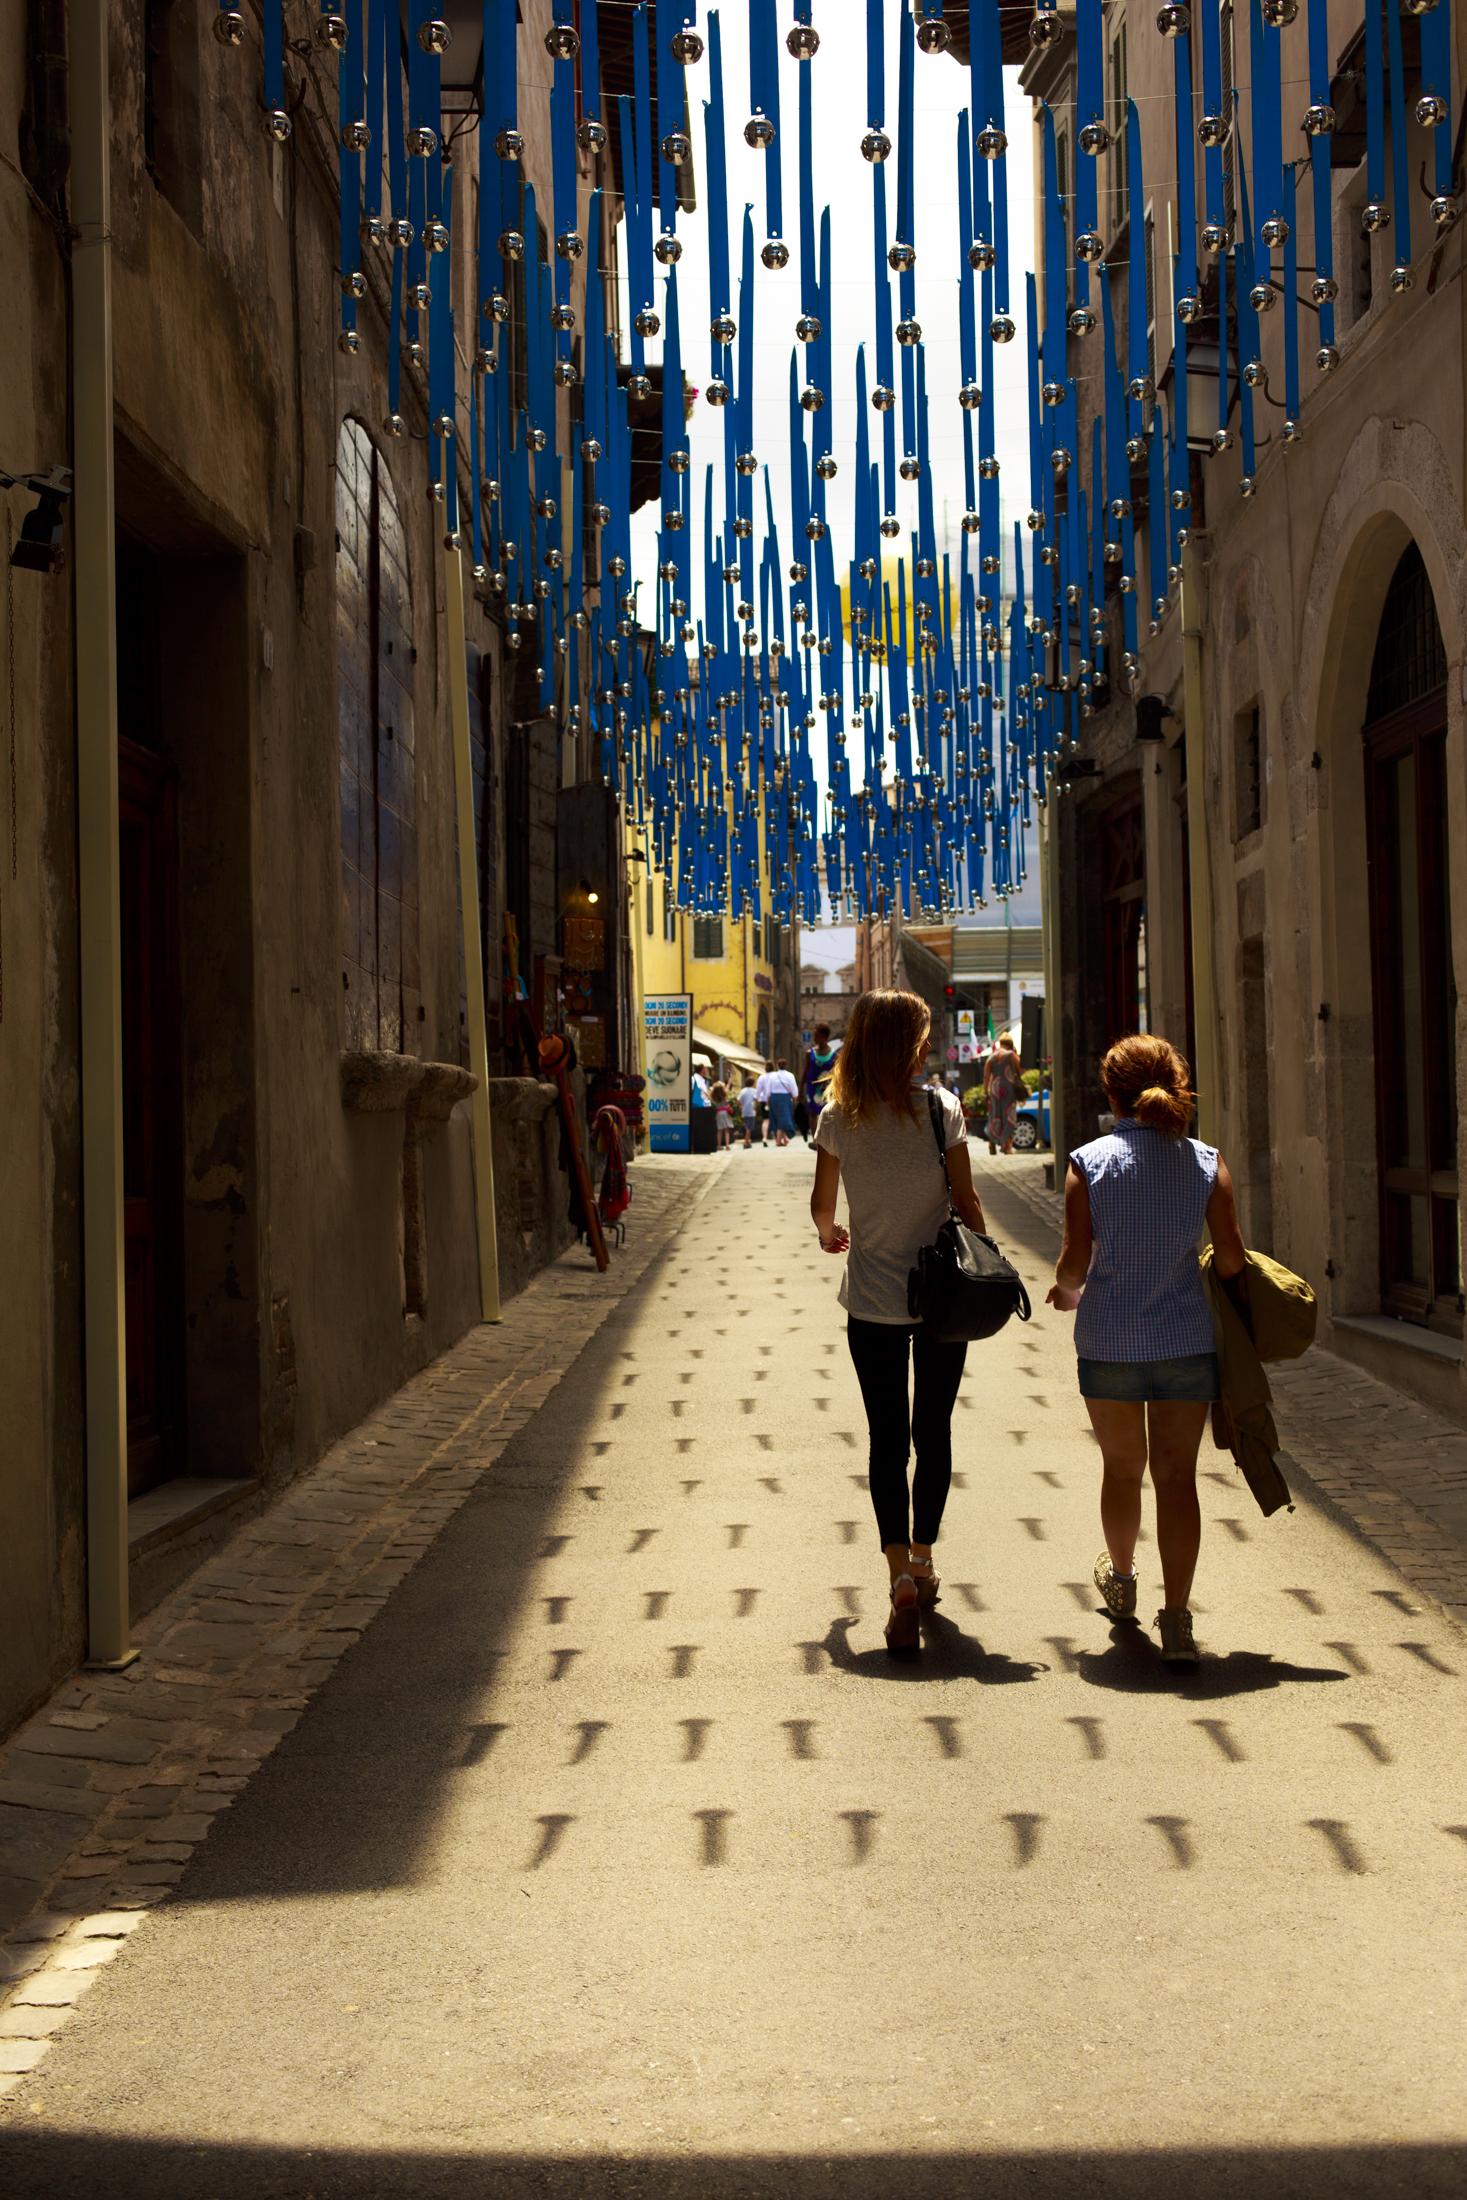 Spoleto Street with Bells